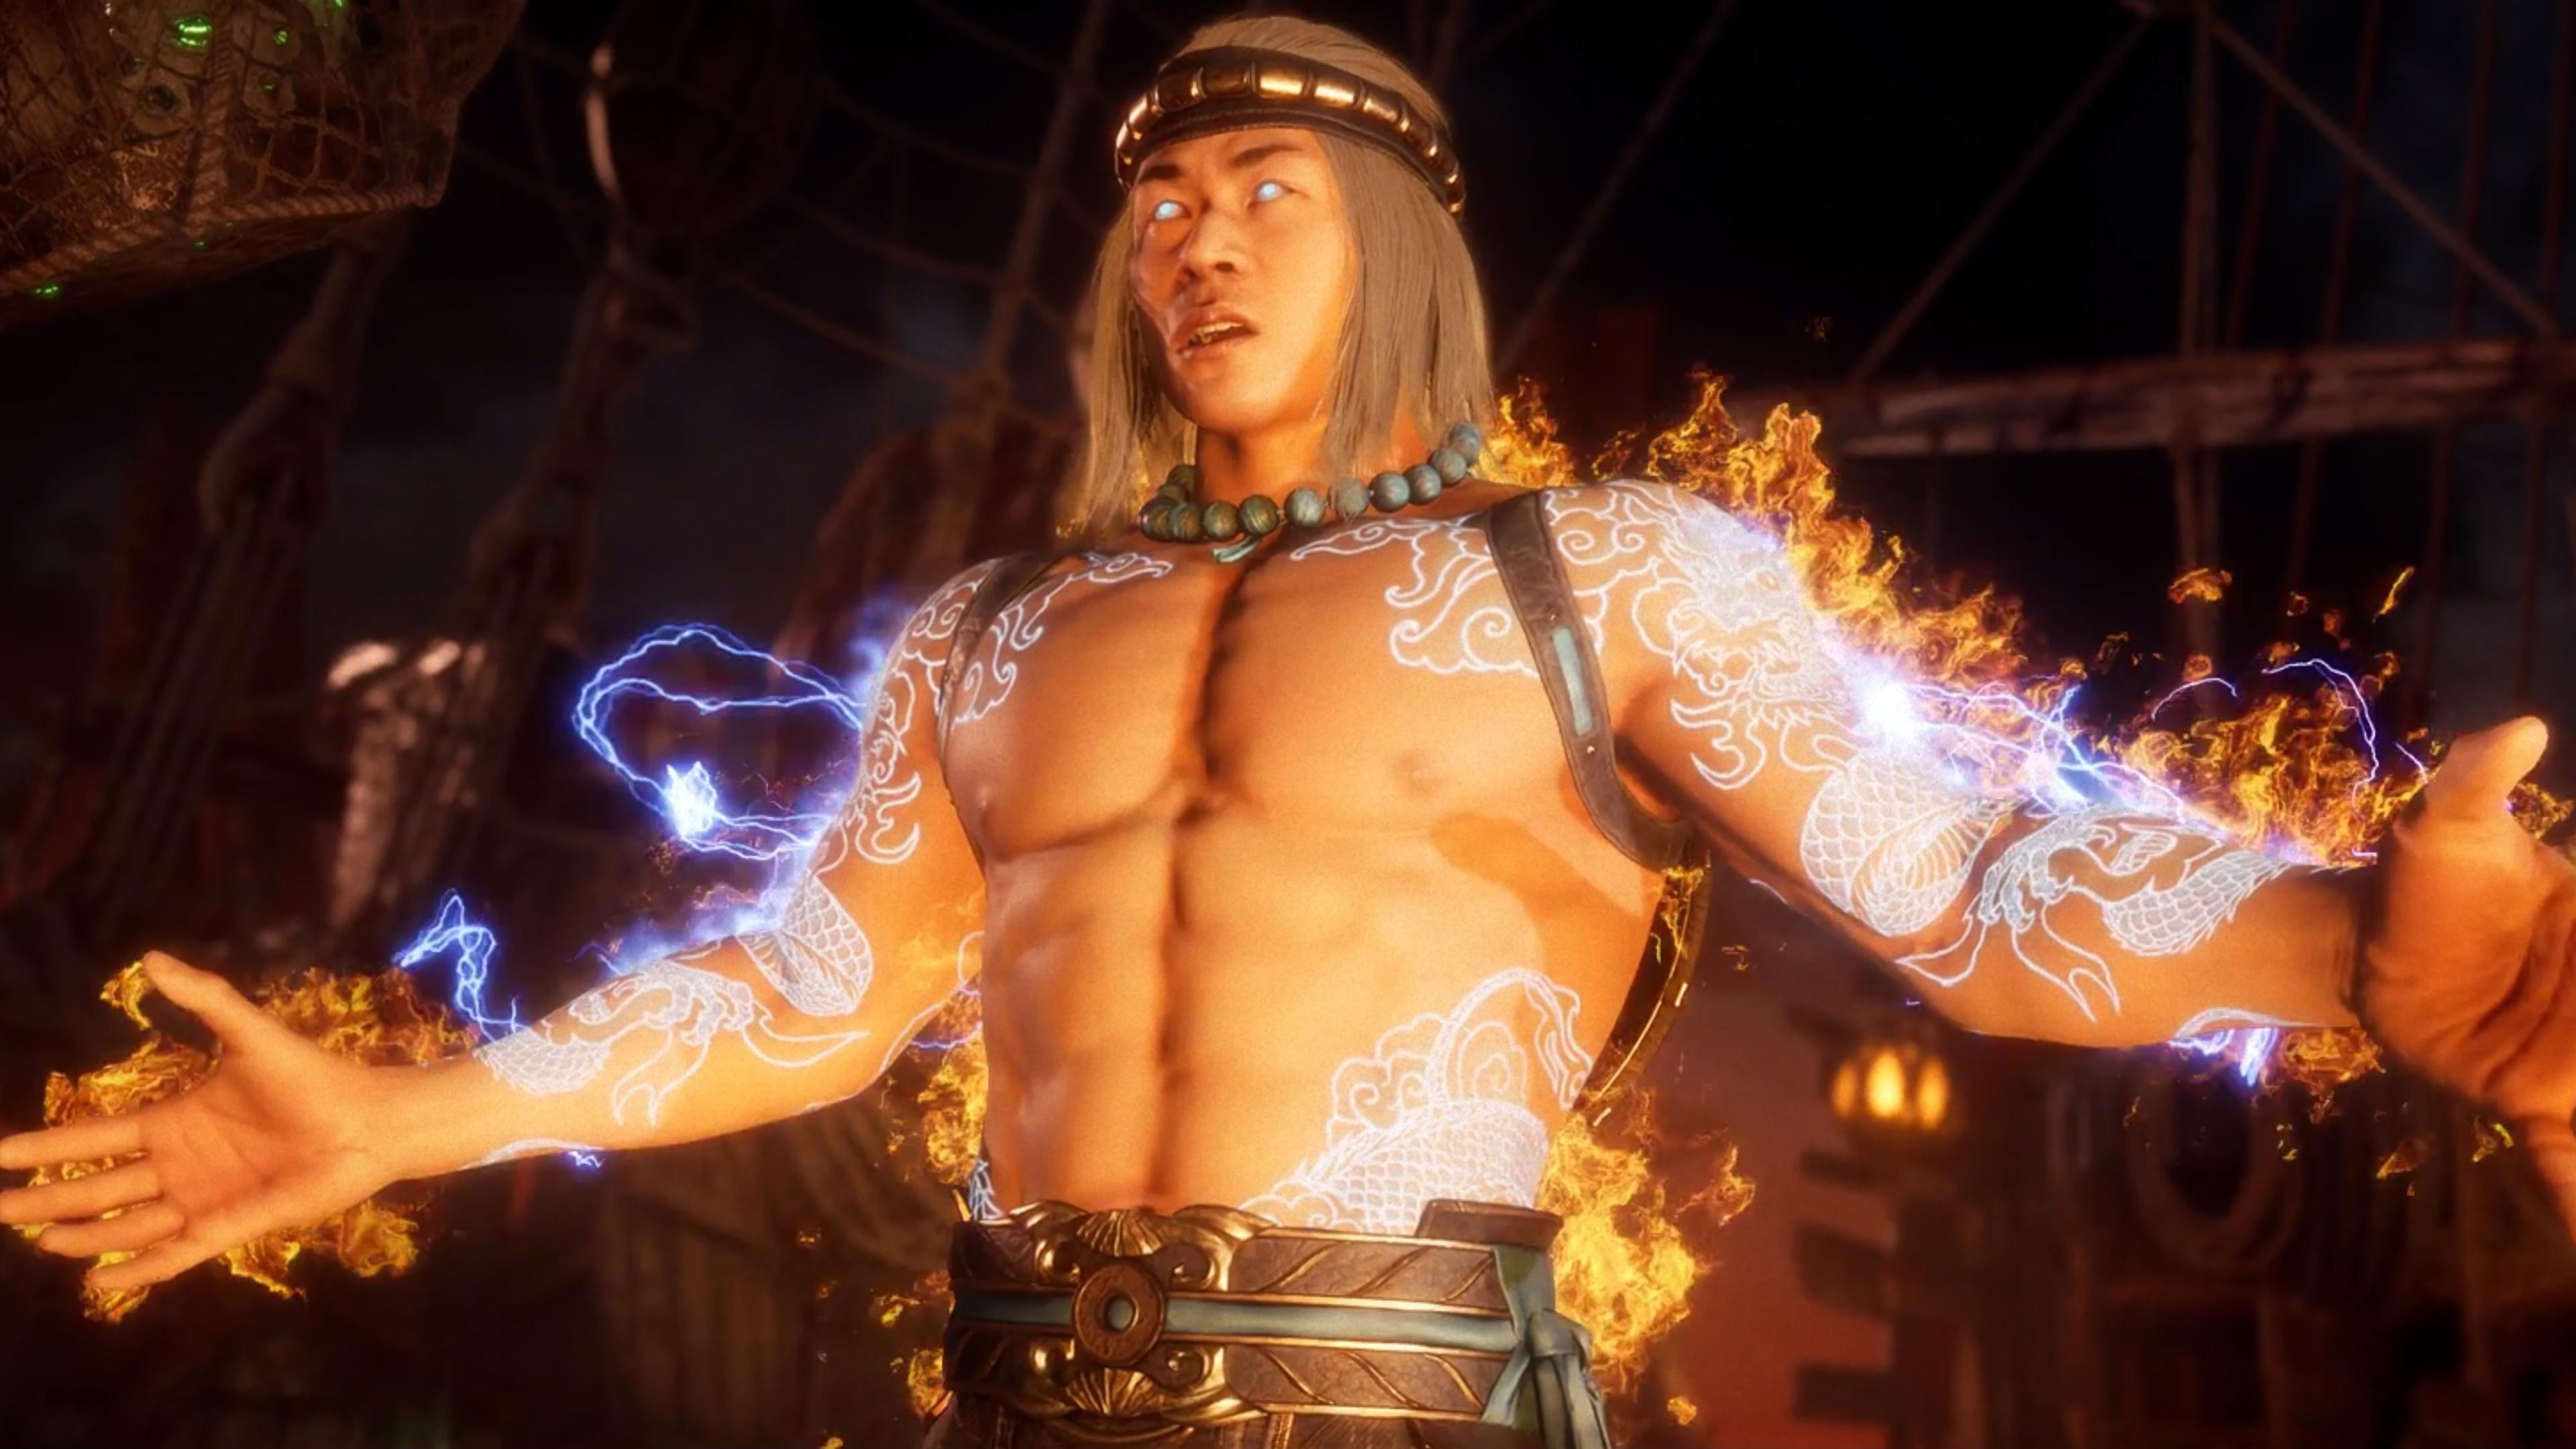 4k Mortal Kombat 11 Fire God Liu Kang 1154179 Hd Wallpaper